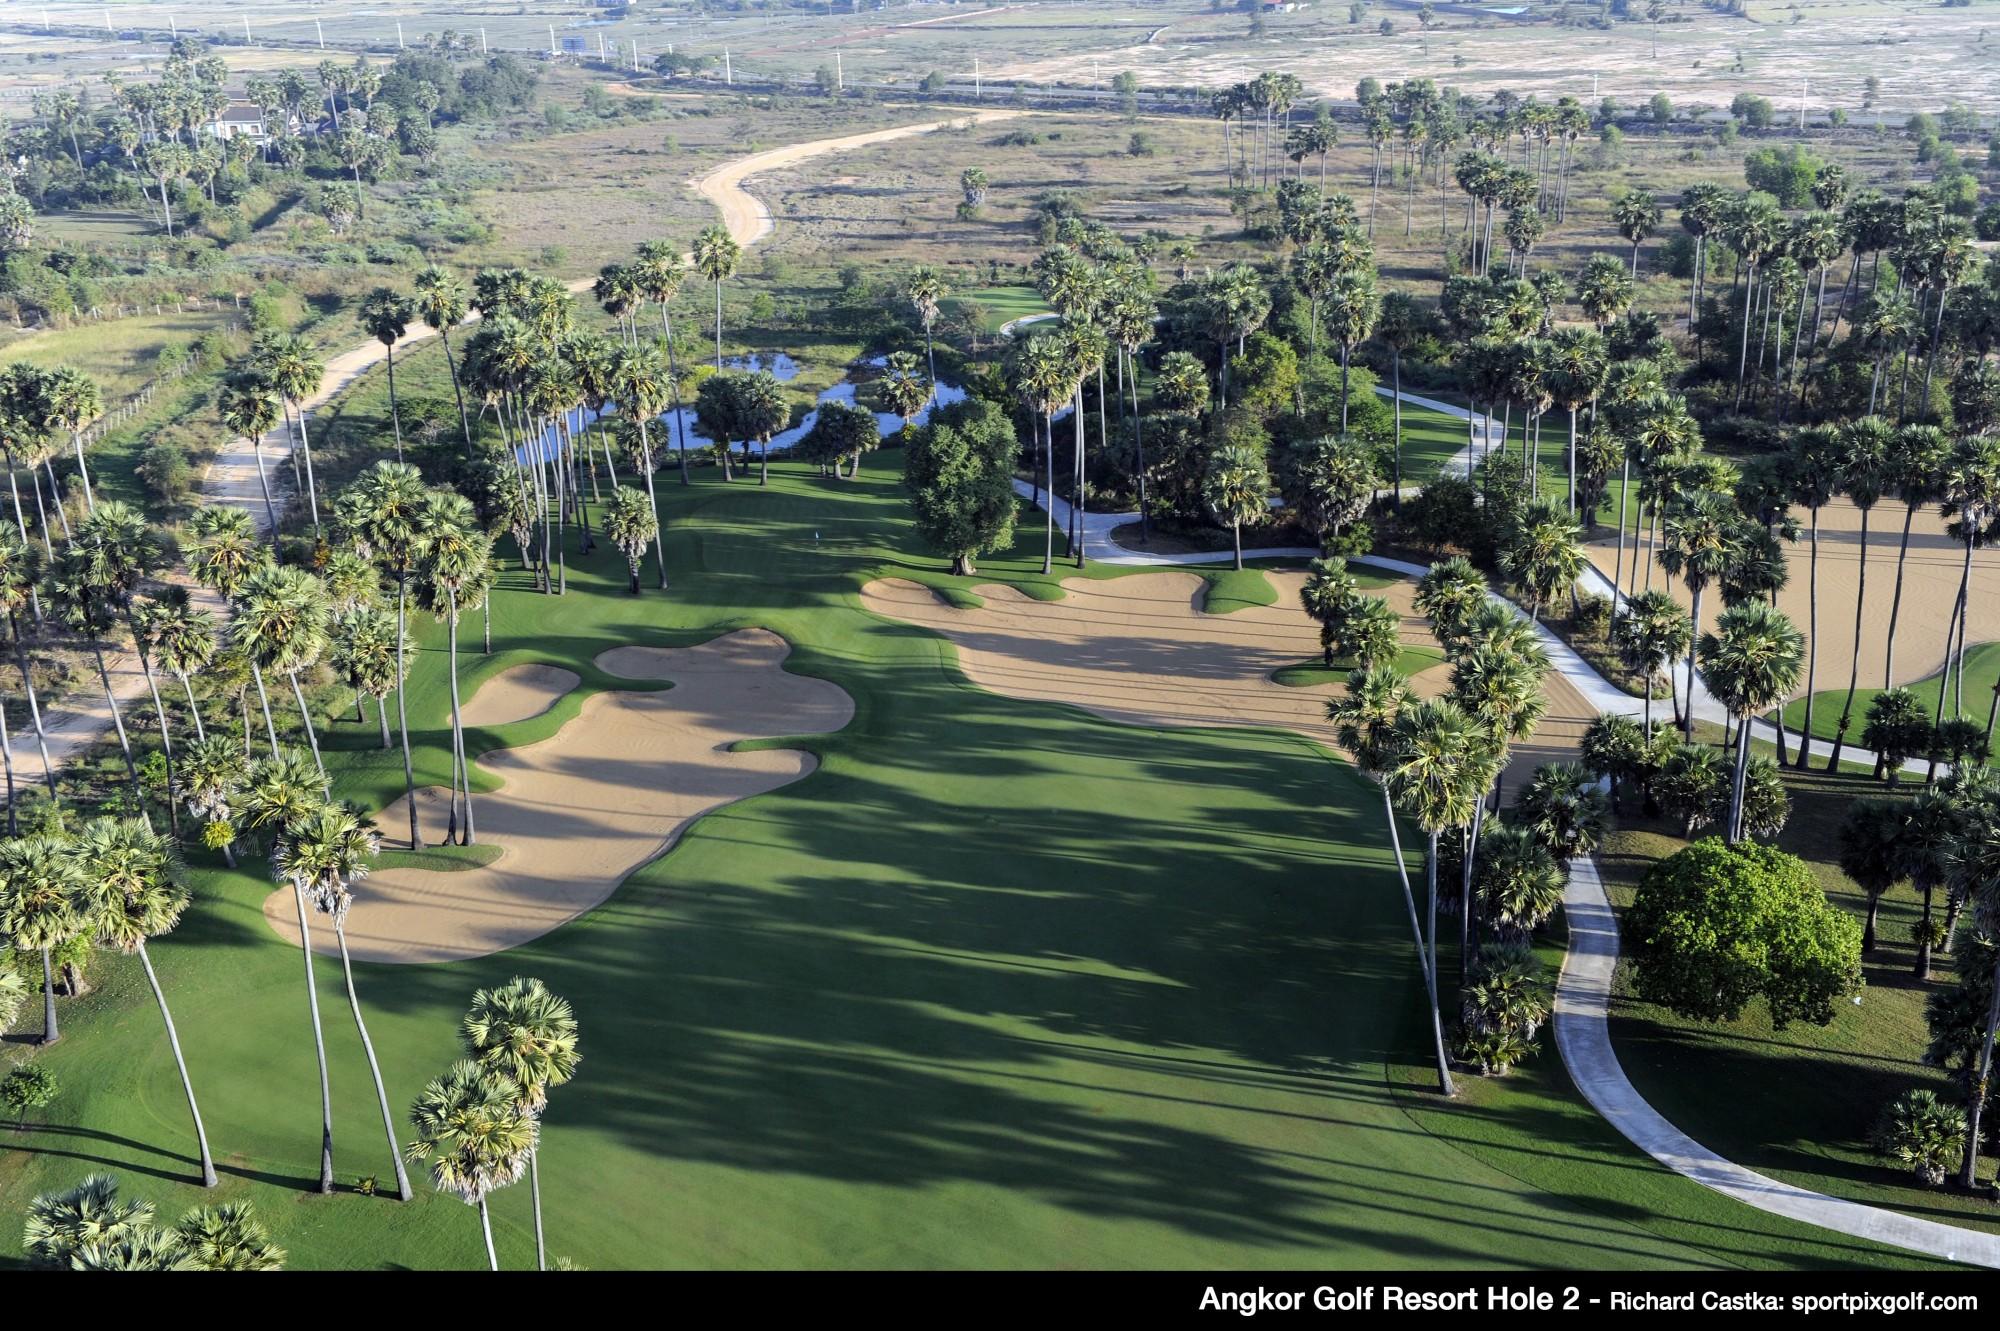 Angkor Golf Resort hole 2